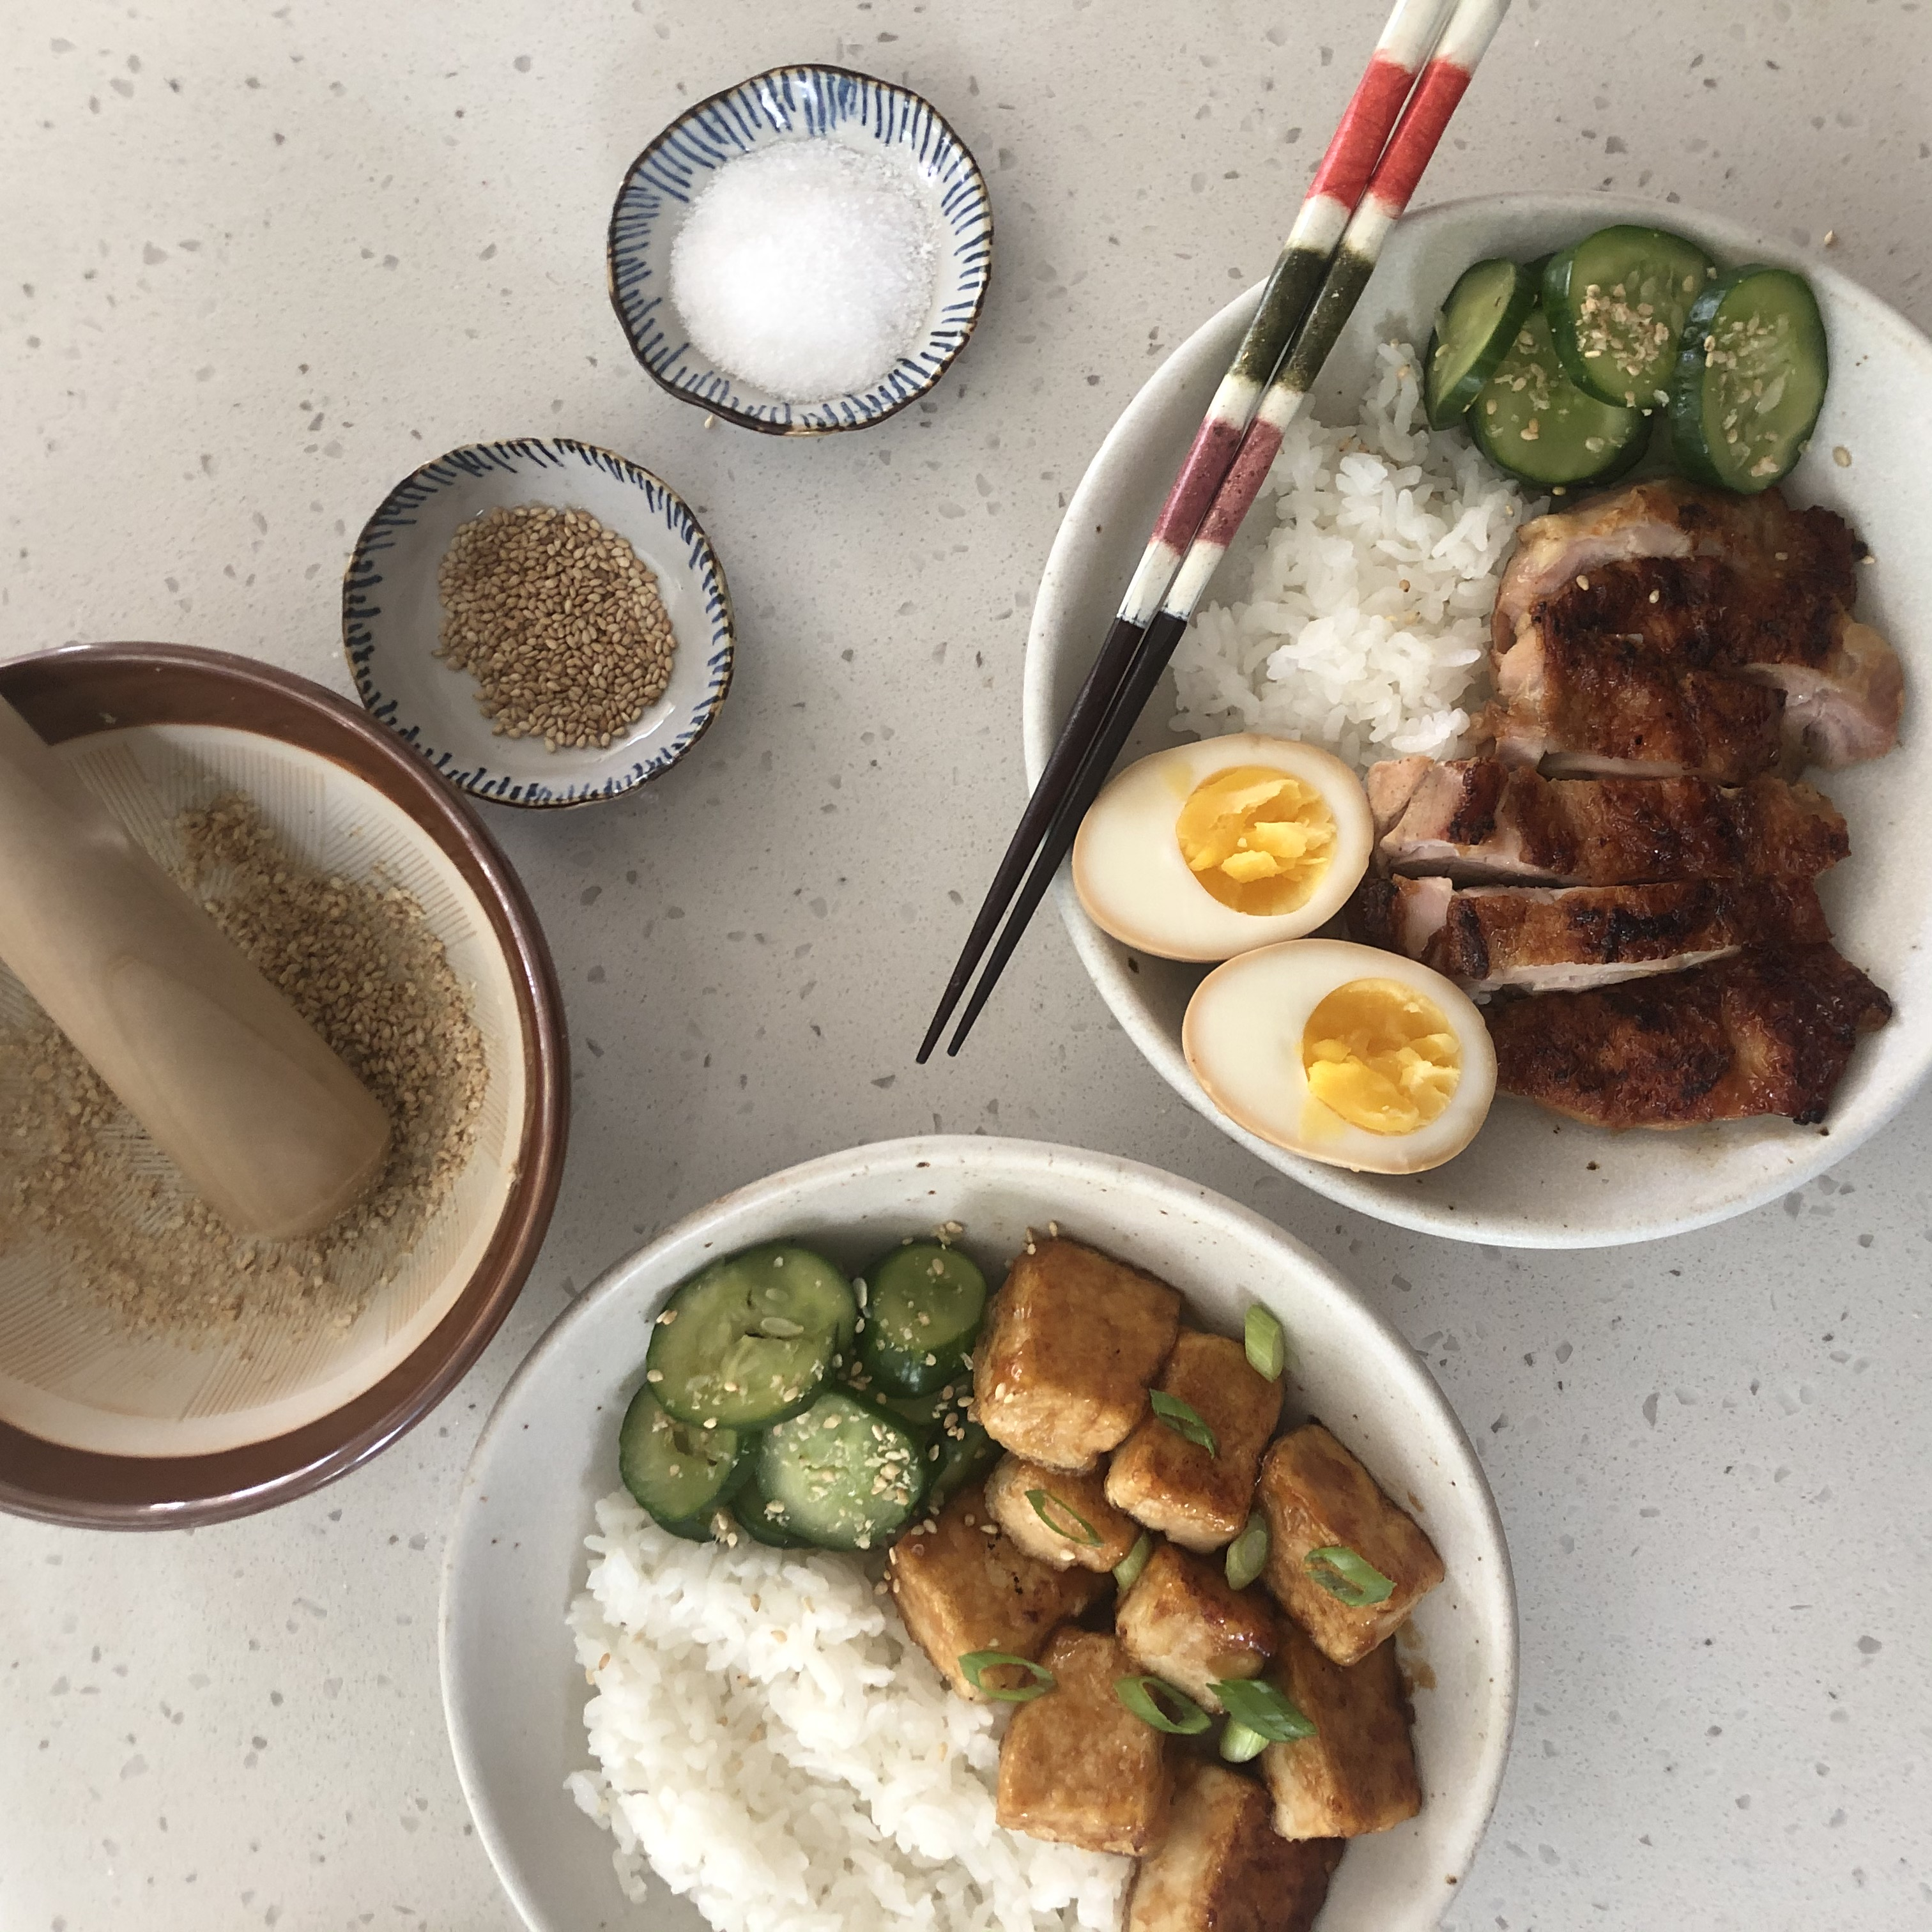 Cook Authentic Japanese Dishes | Teriyaki, Okonomiyaki, Gyoza, Sushi, & More | Vegan & Vegetarian-Friendly 3